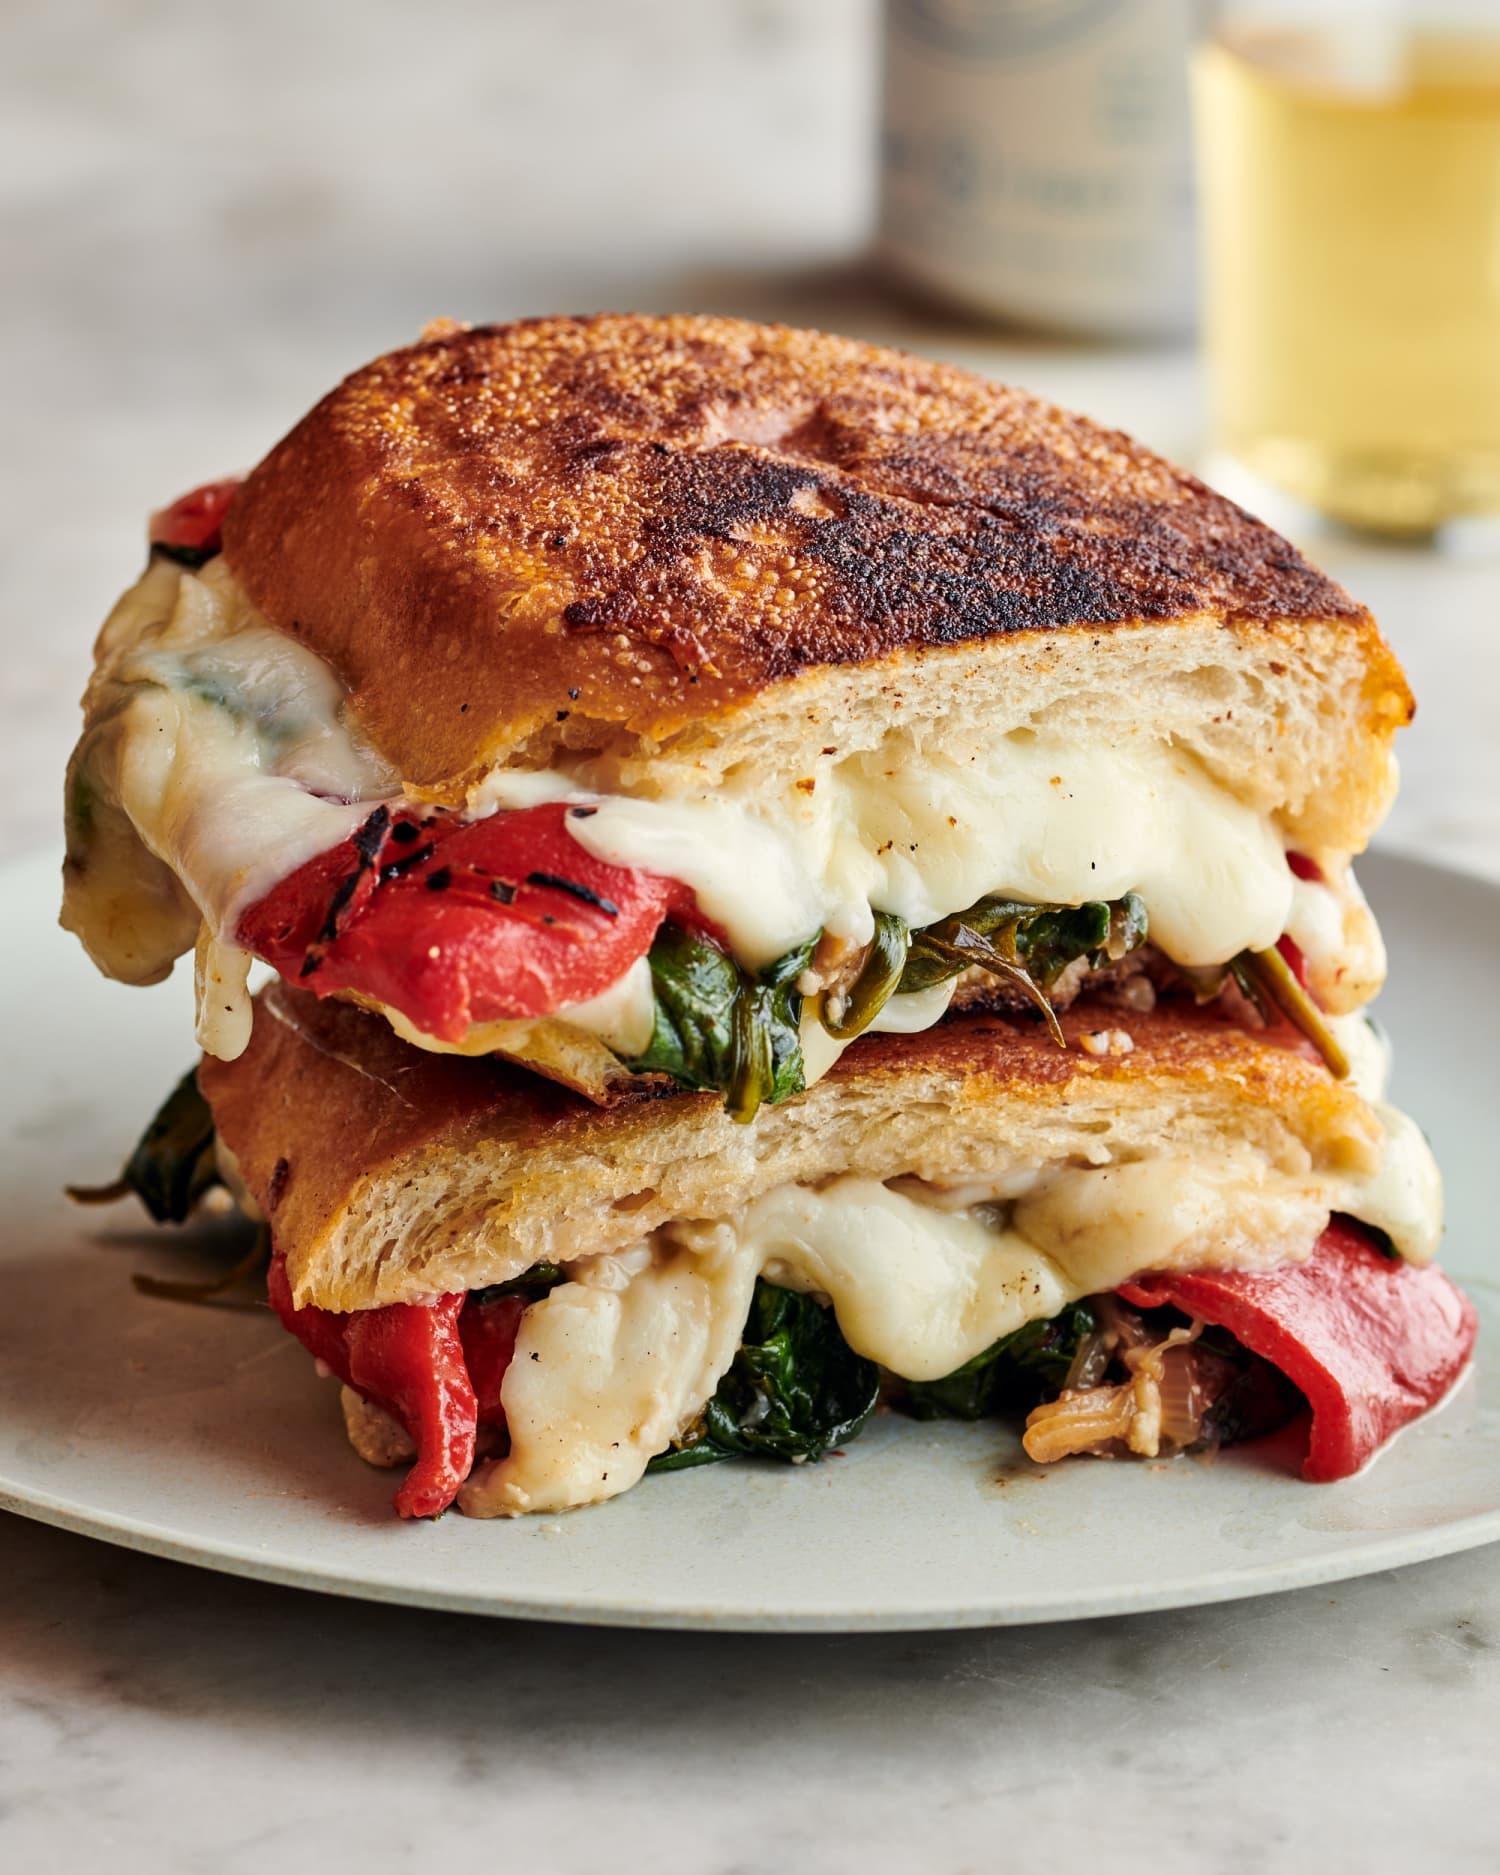 Sandwiches - cover